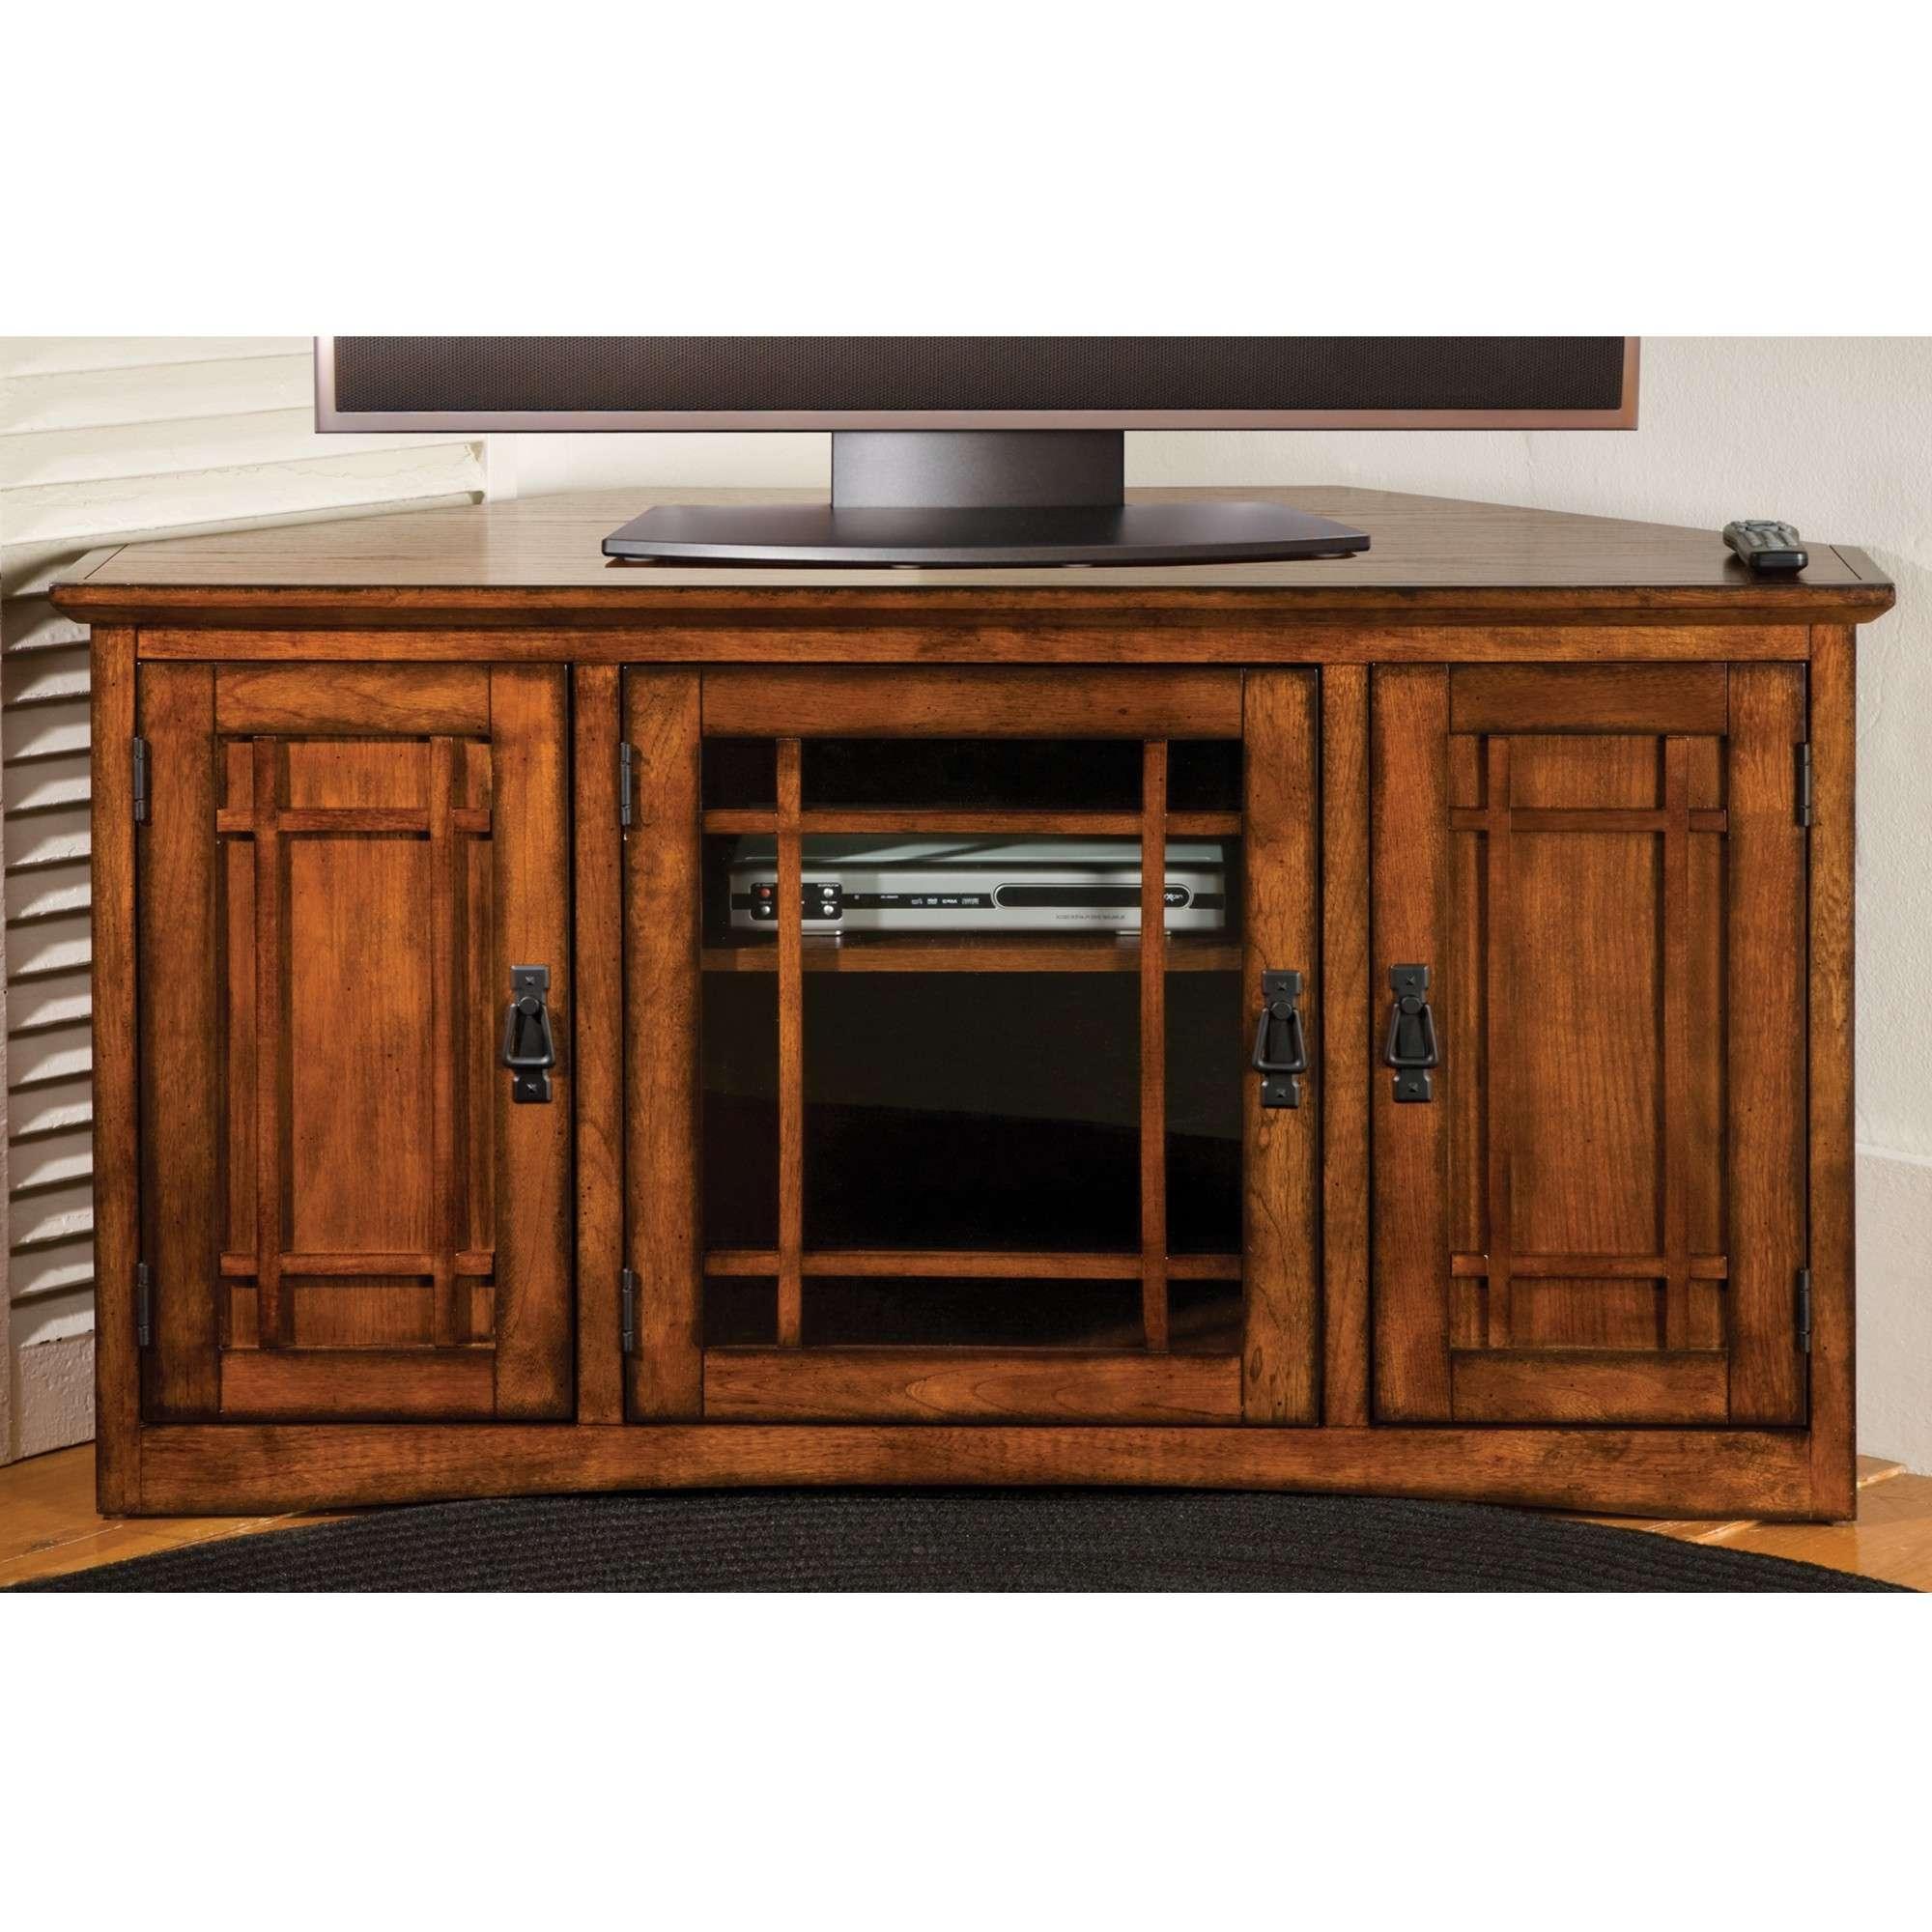 Mission Corner Tv Cabinet | Sturbridge Yankee Workshop Within Black Corner Tv Cabinets With Glass Doors (View 8 of 20)